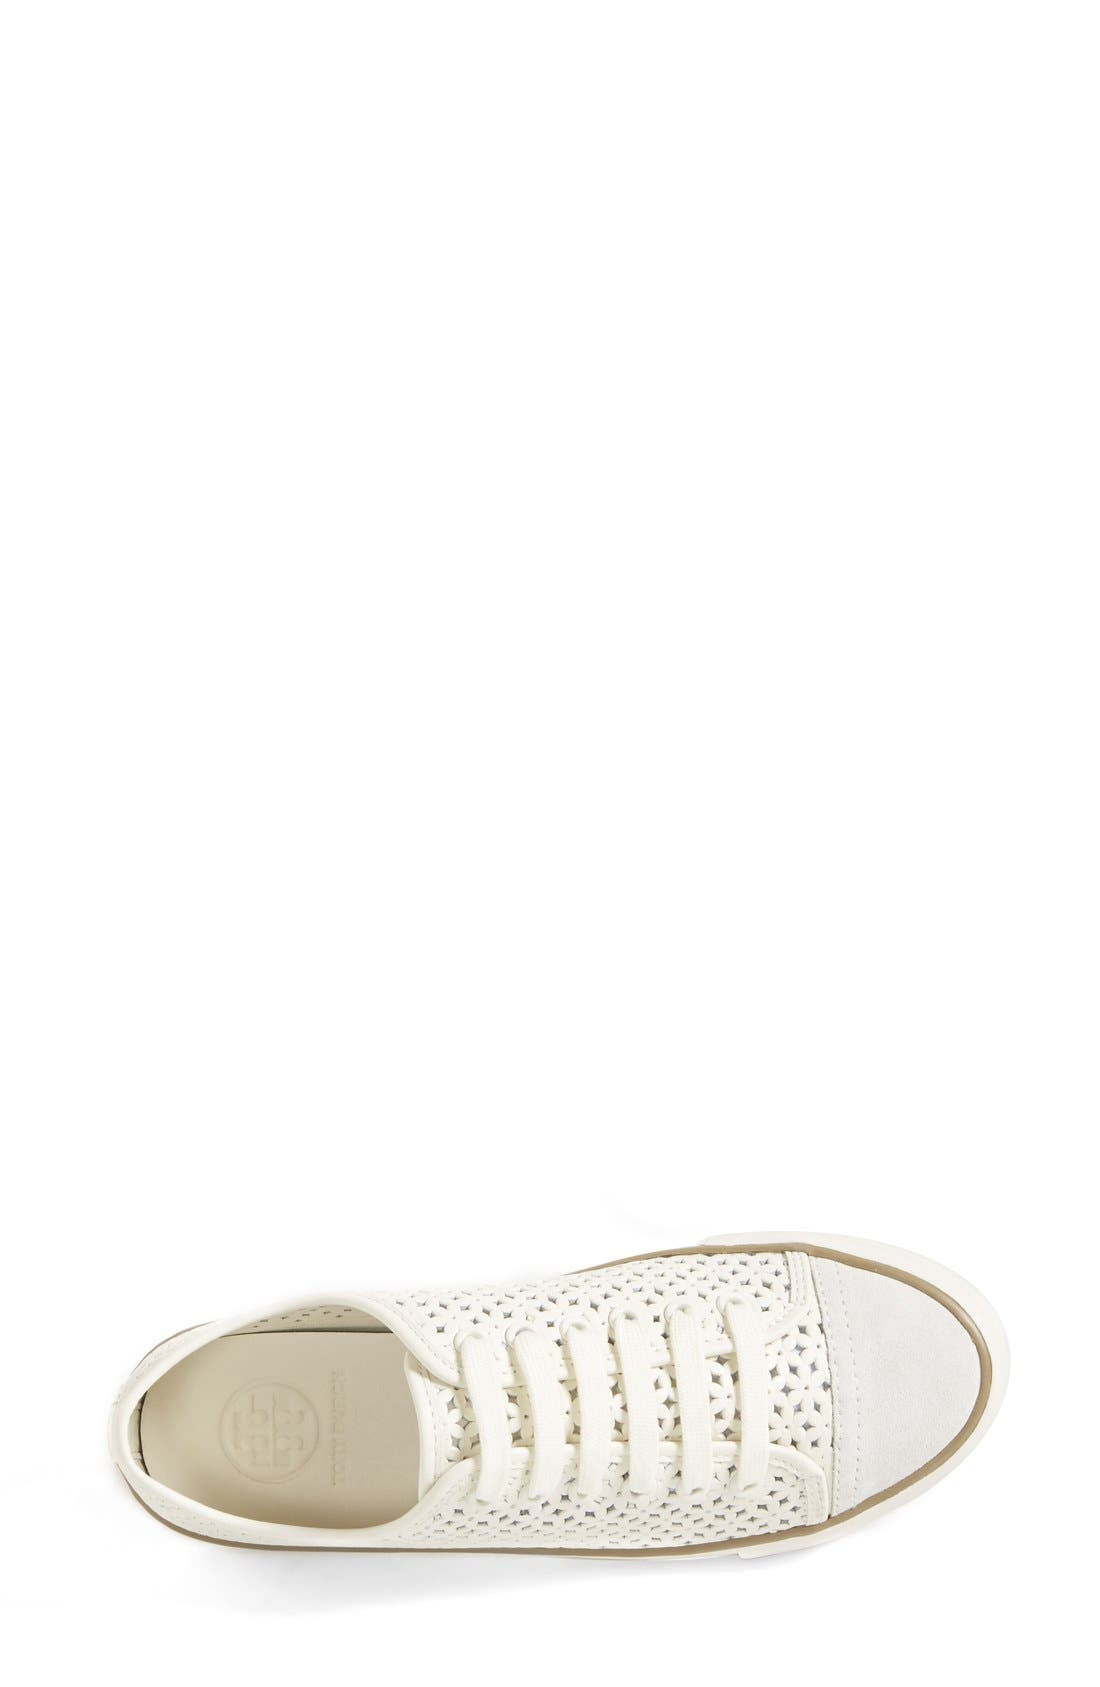 Alternate Image 3  - Tory Burch 'Daisy' Perforated Sneaker (Women)